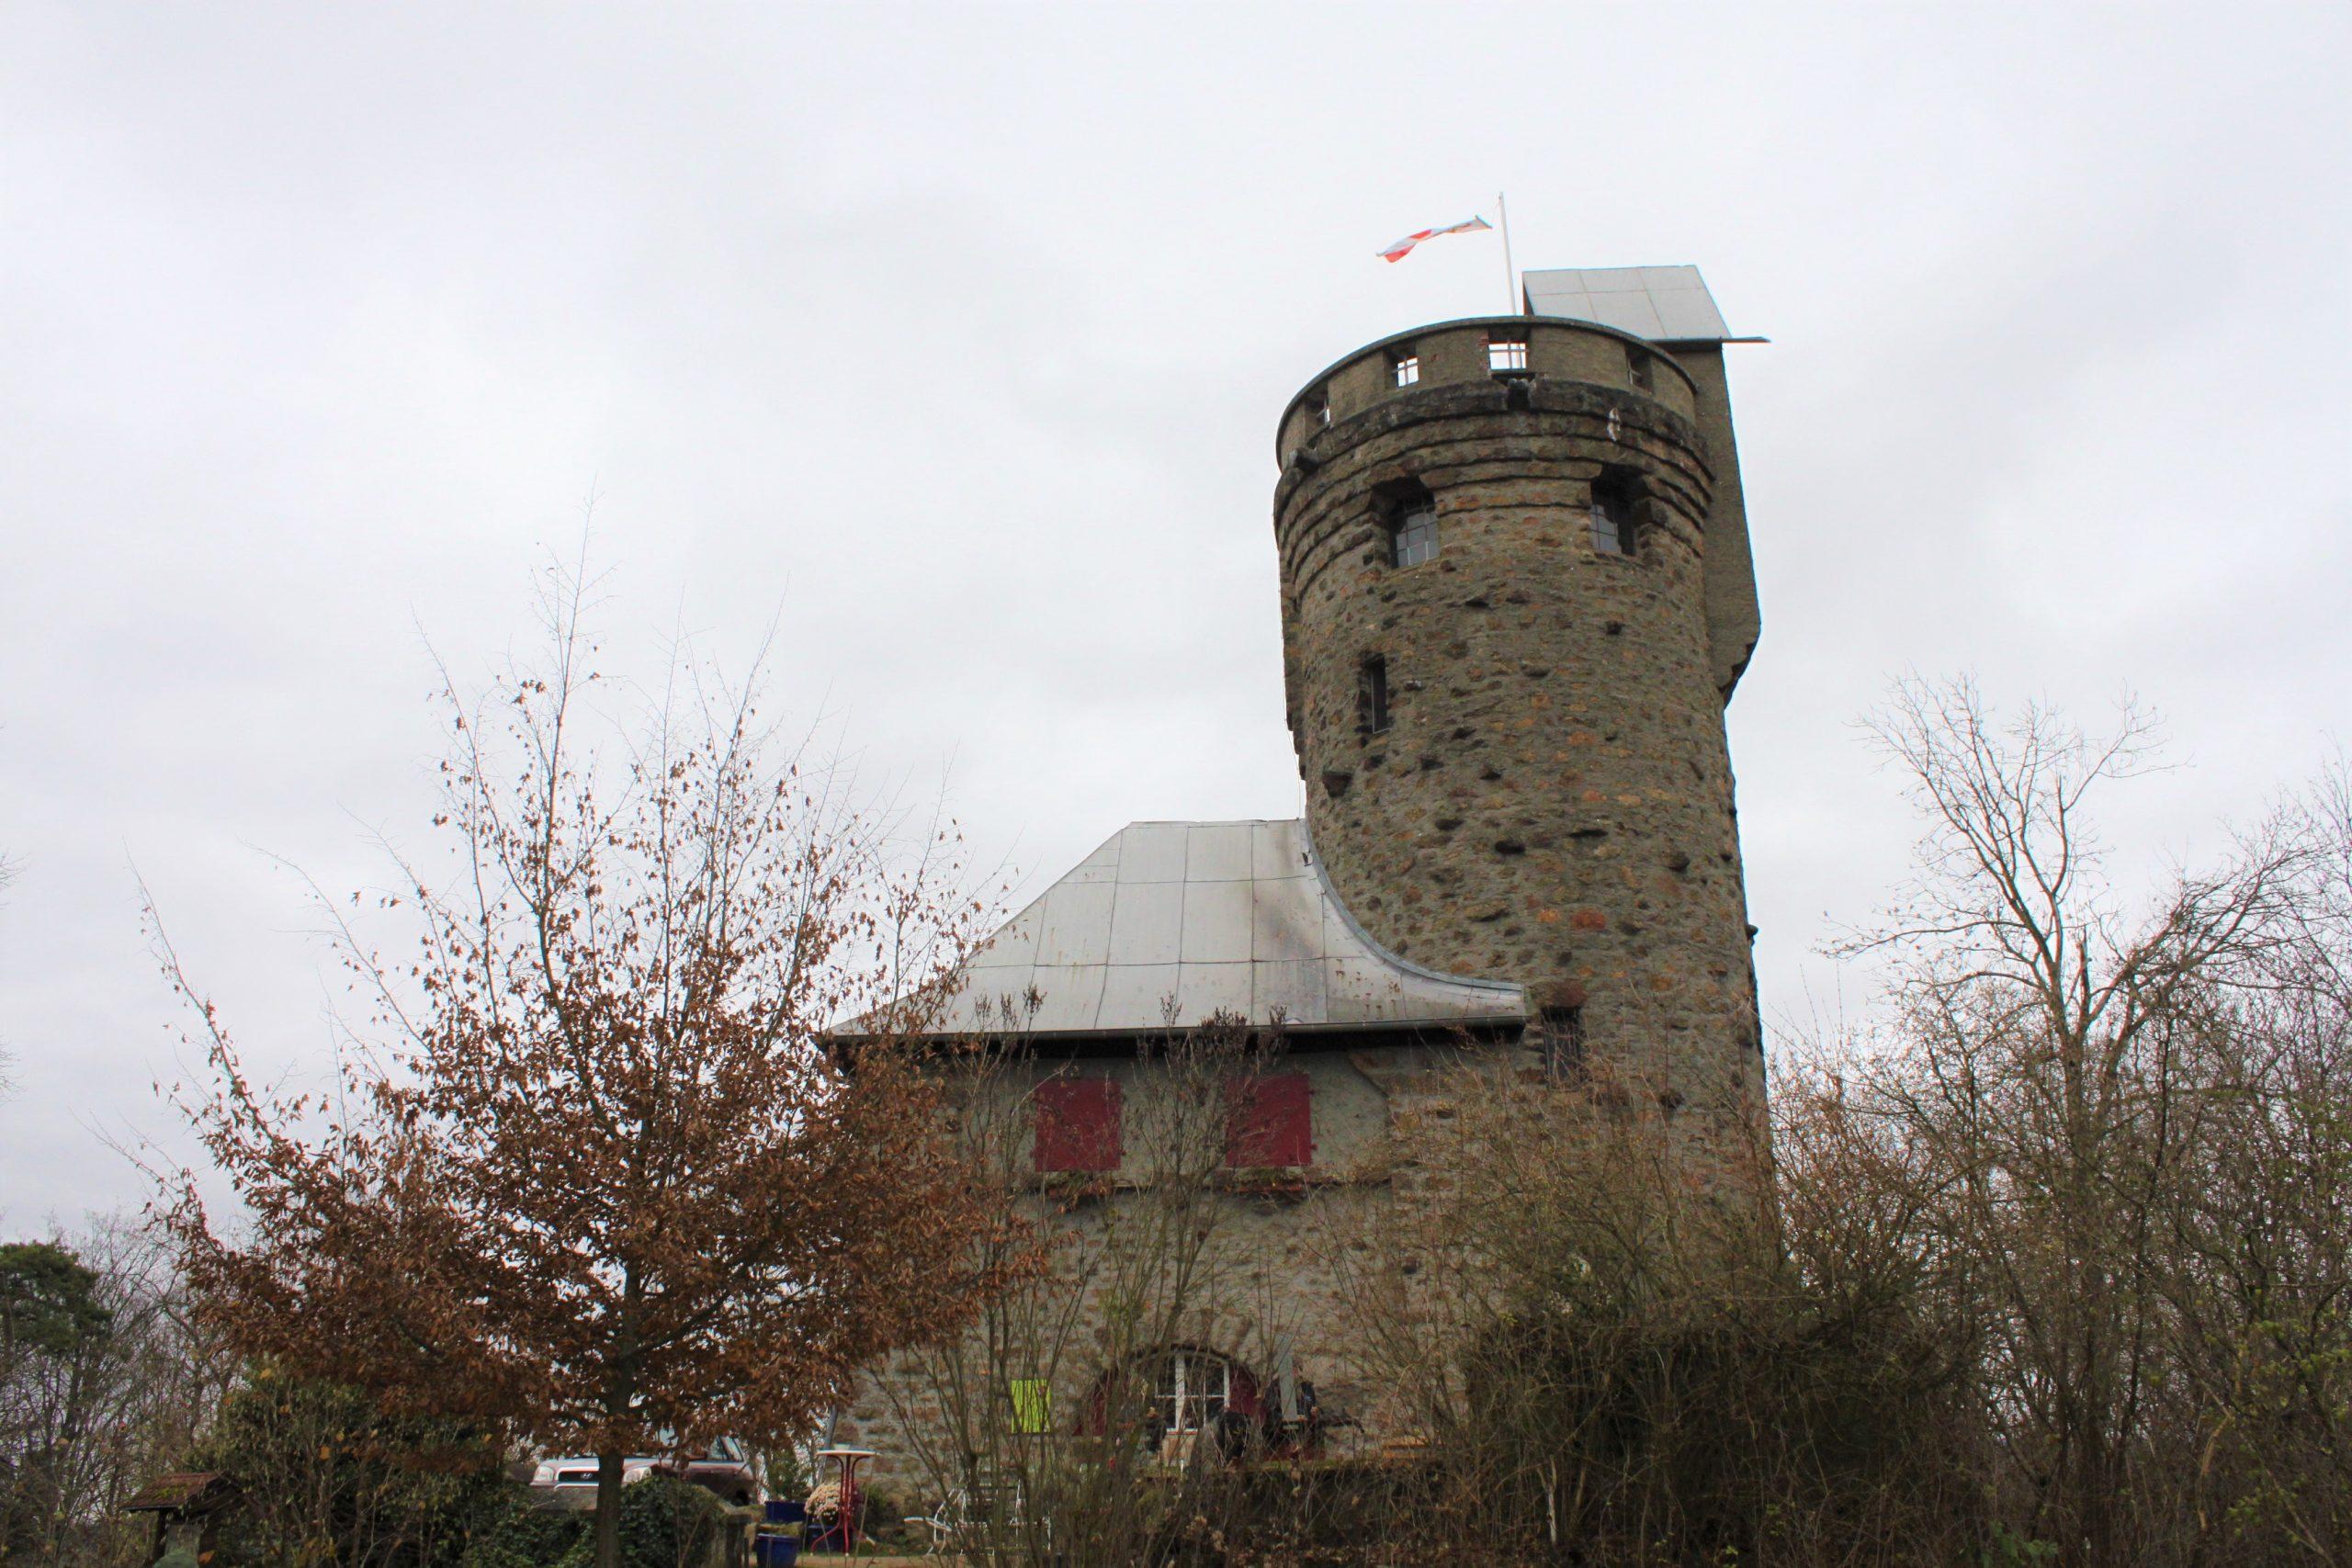 Turm im Winter